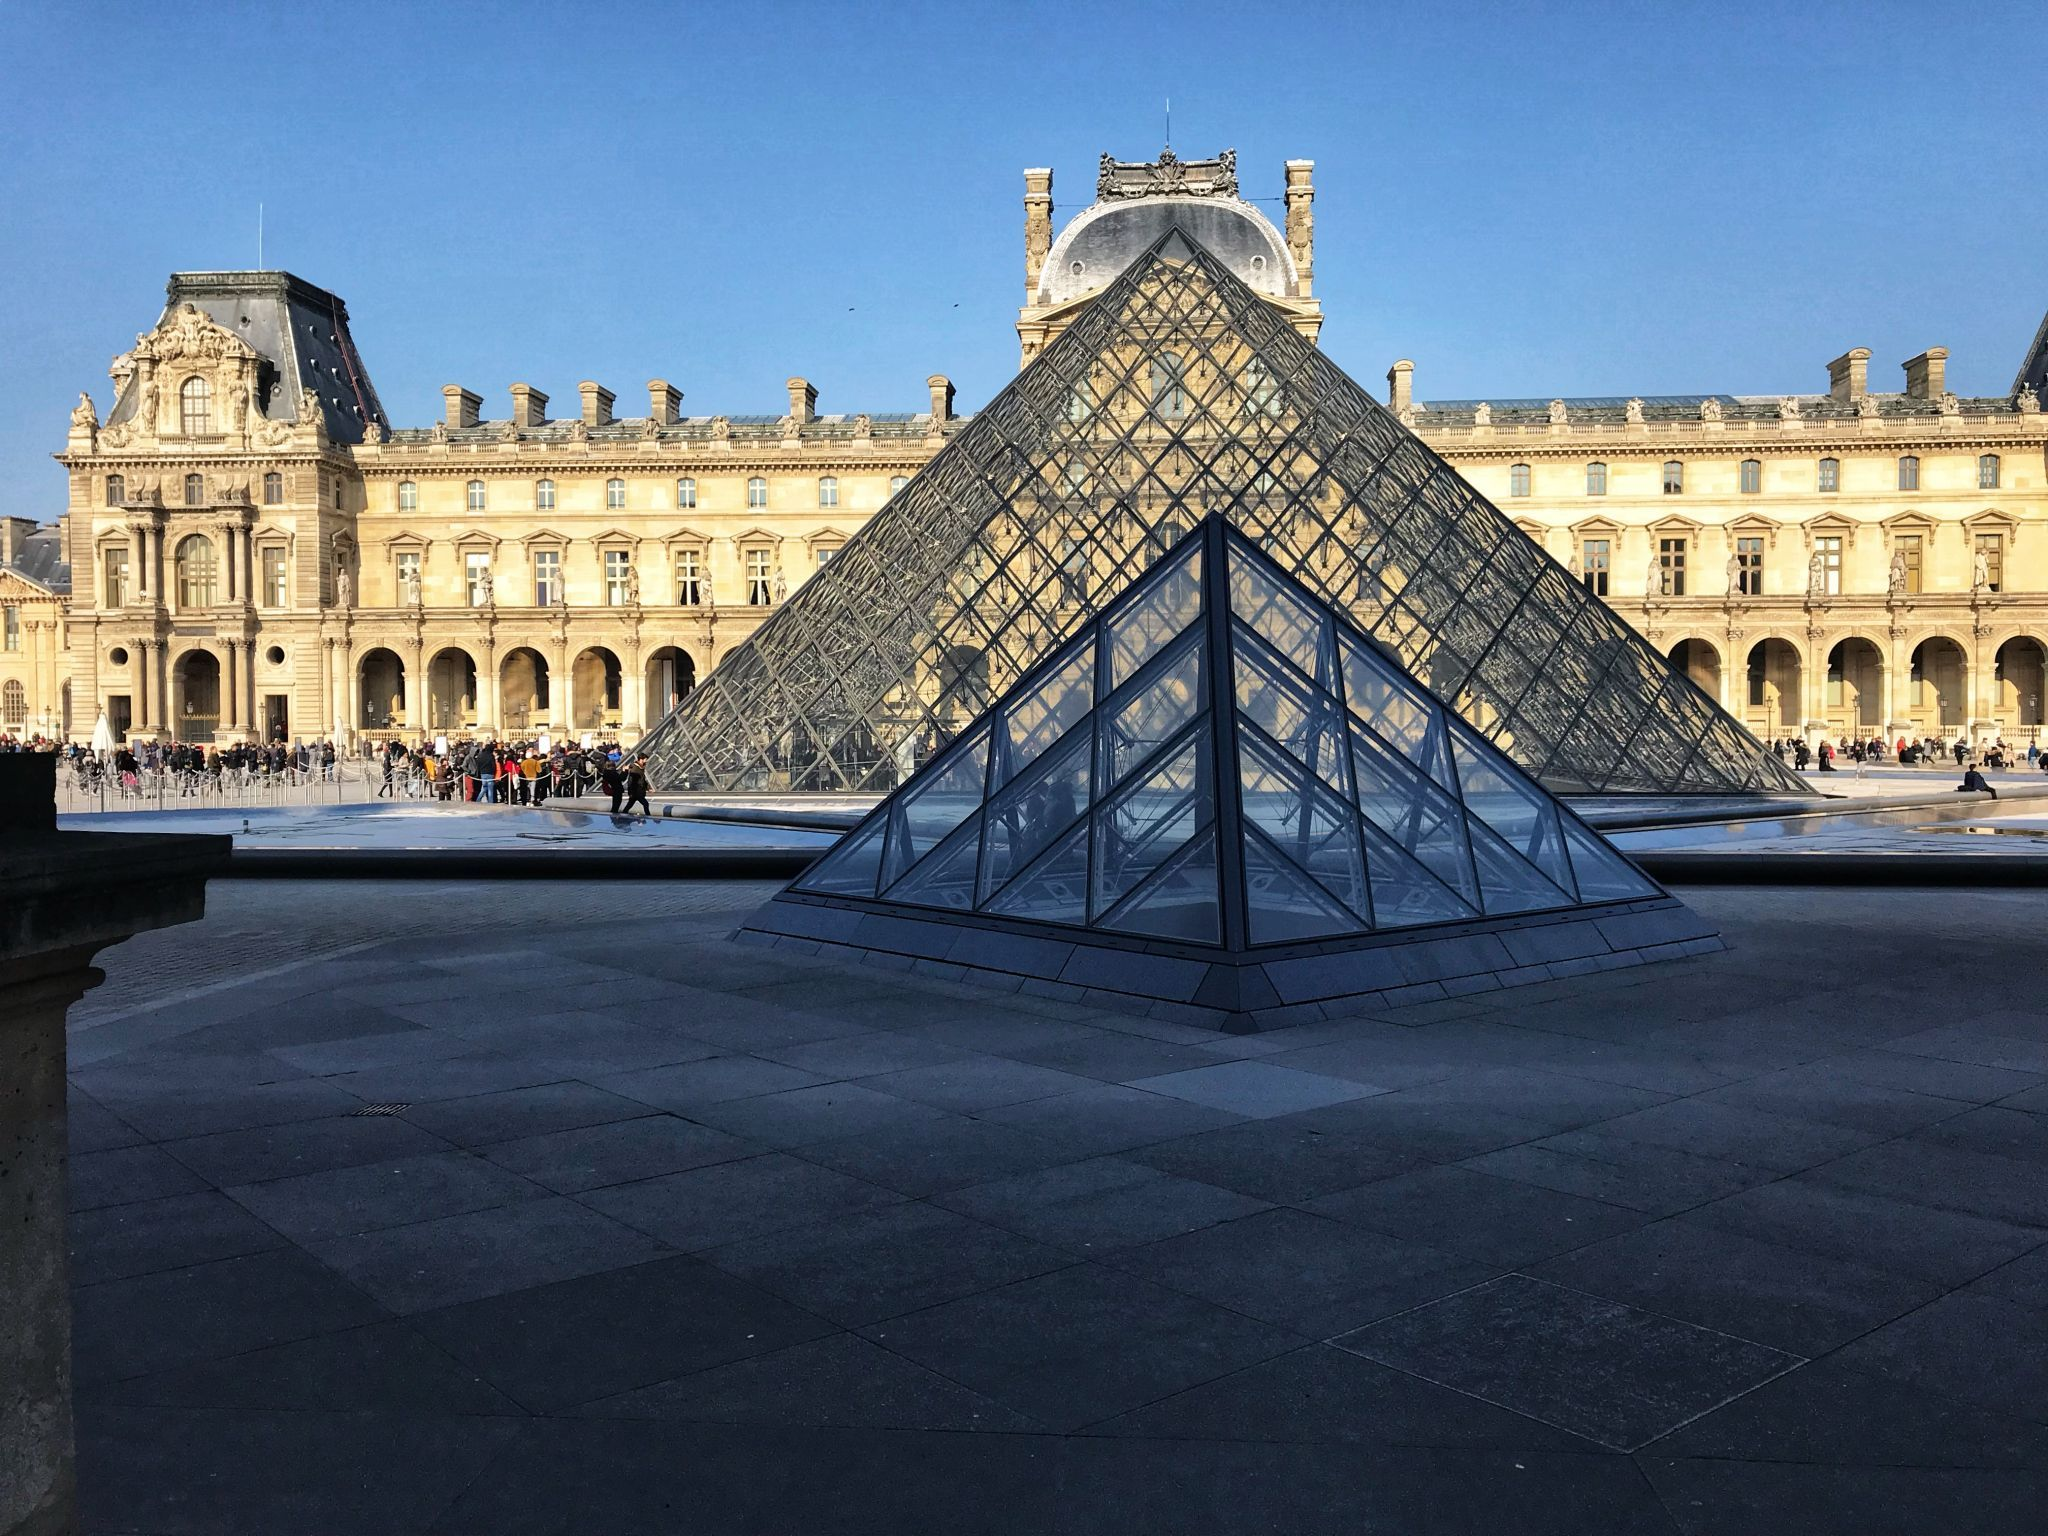 The Pyramids of The Louvre Paris